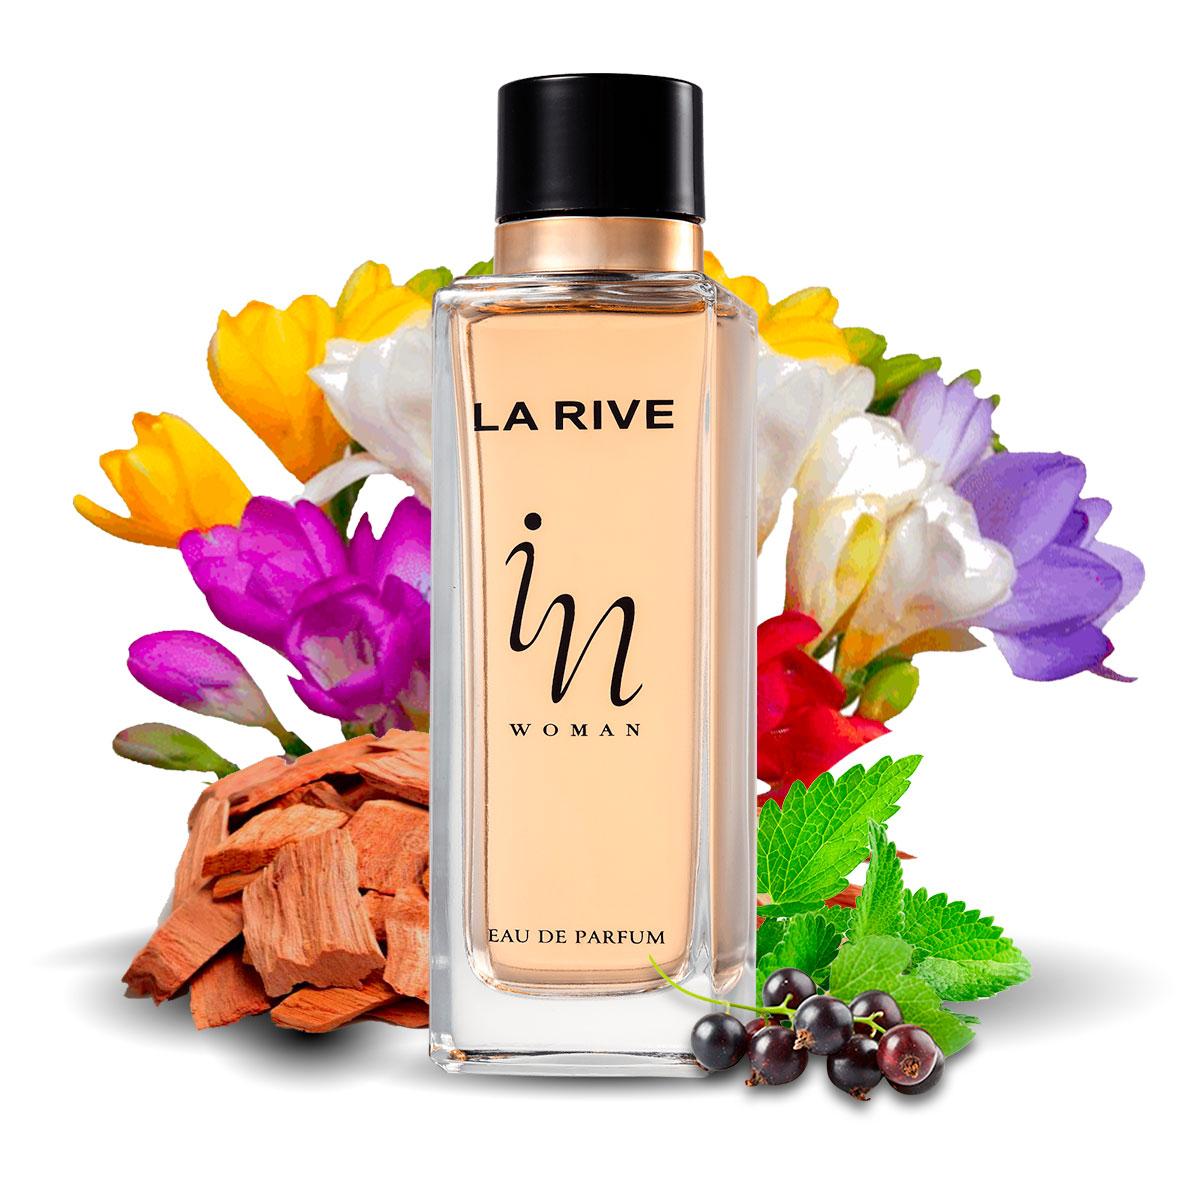 Kit 2 Perfumes Importados In Woman e Lexcellente La Rive